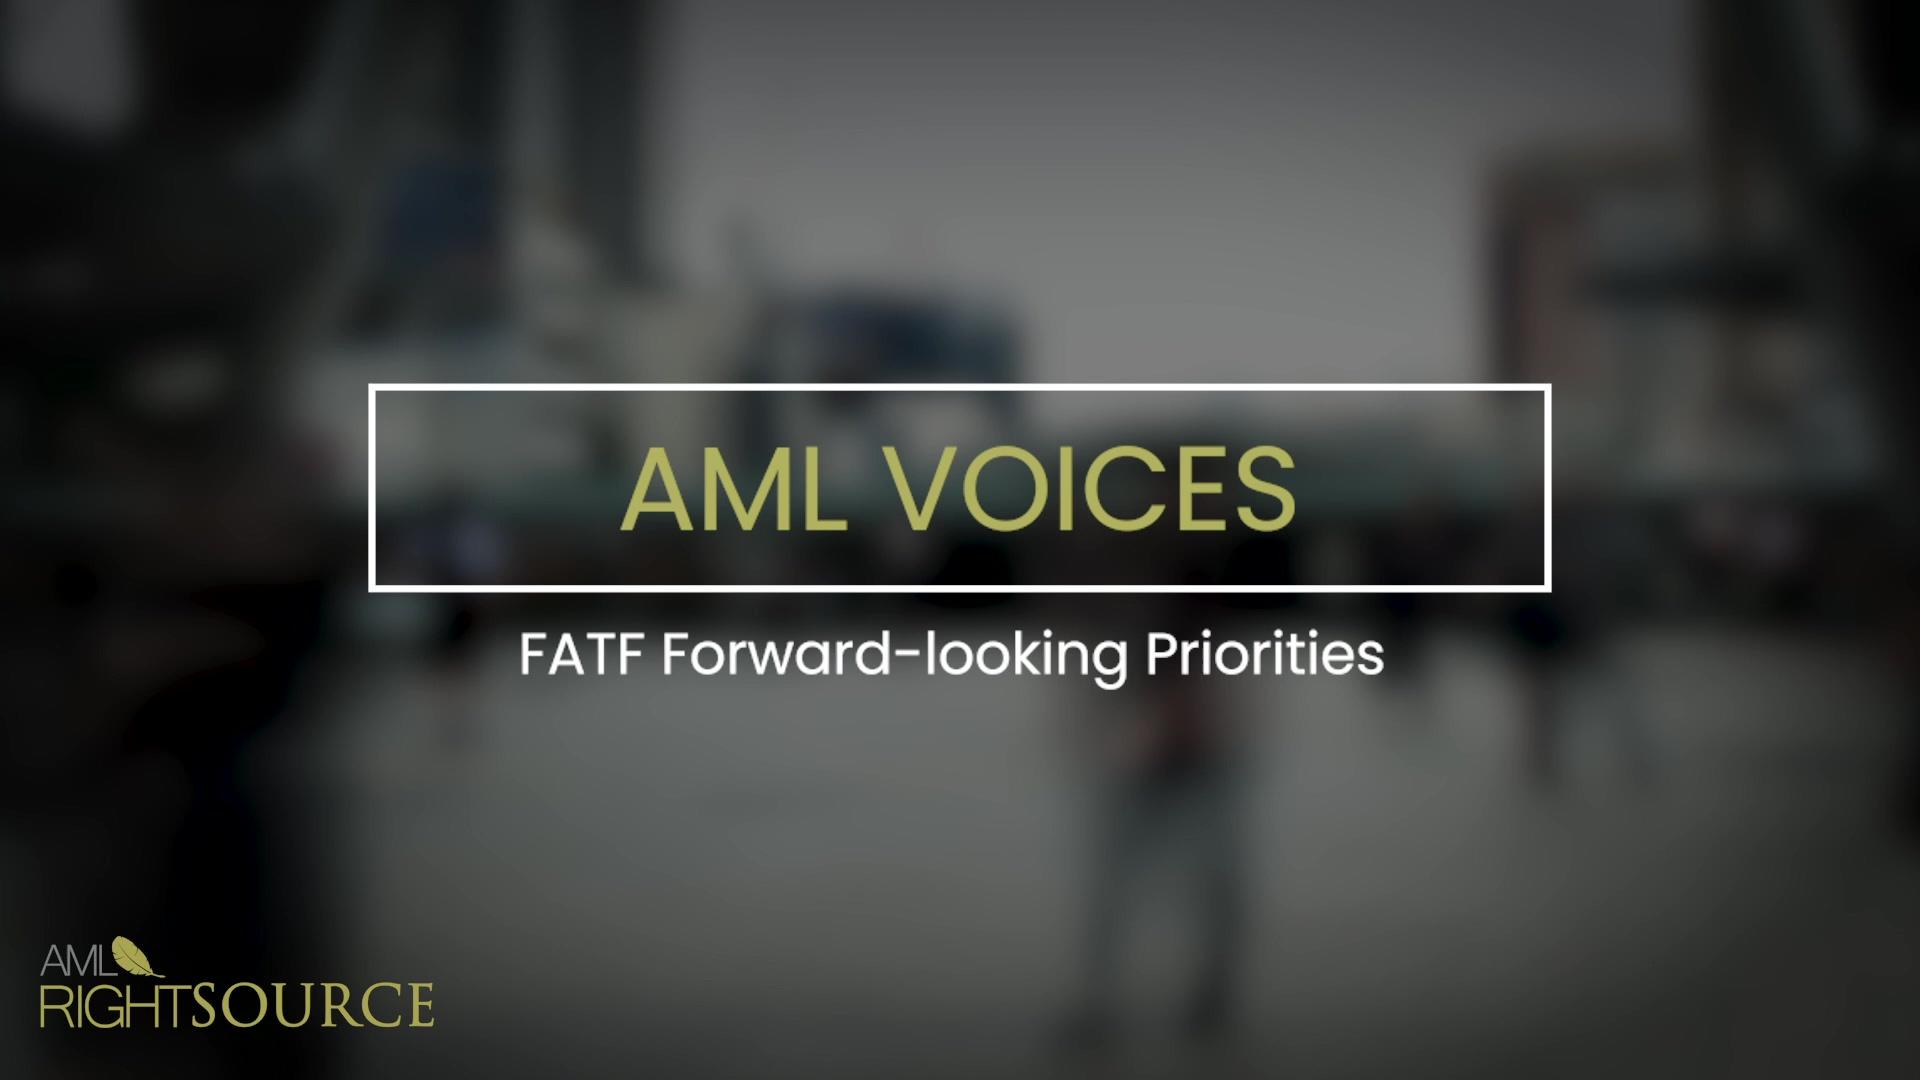 FATF Forward-looking Priorities_Cutdown_V002